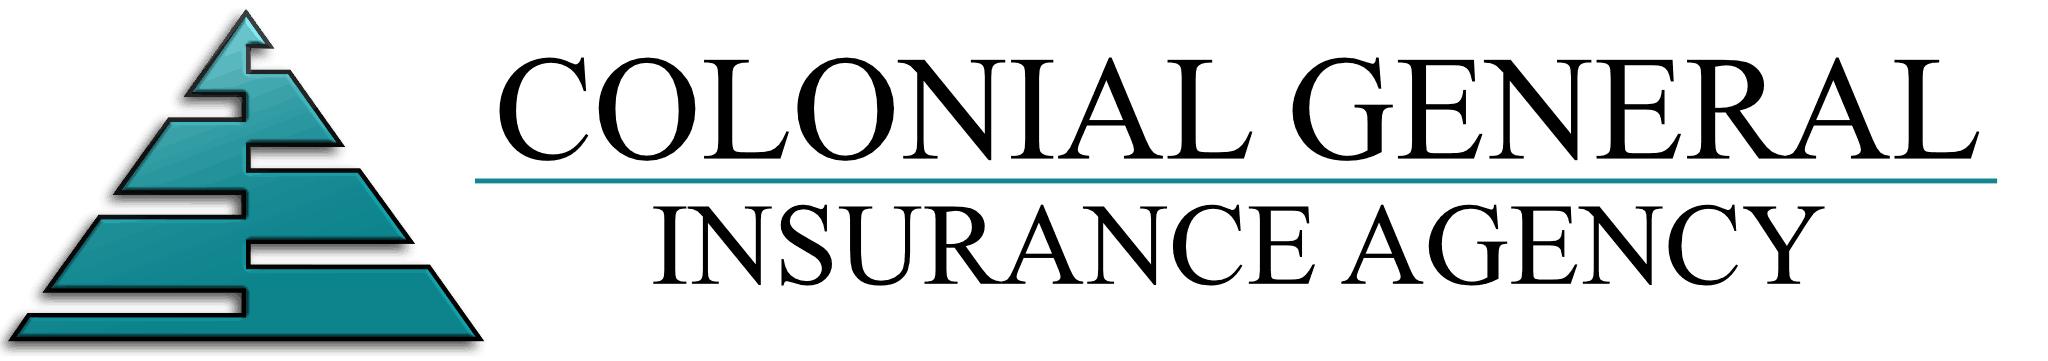 Colonial General Insurance logo